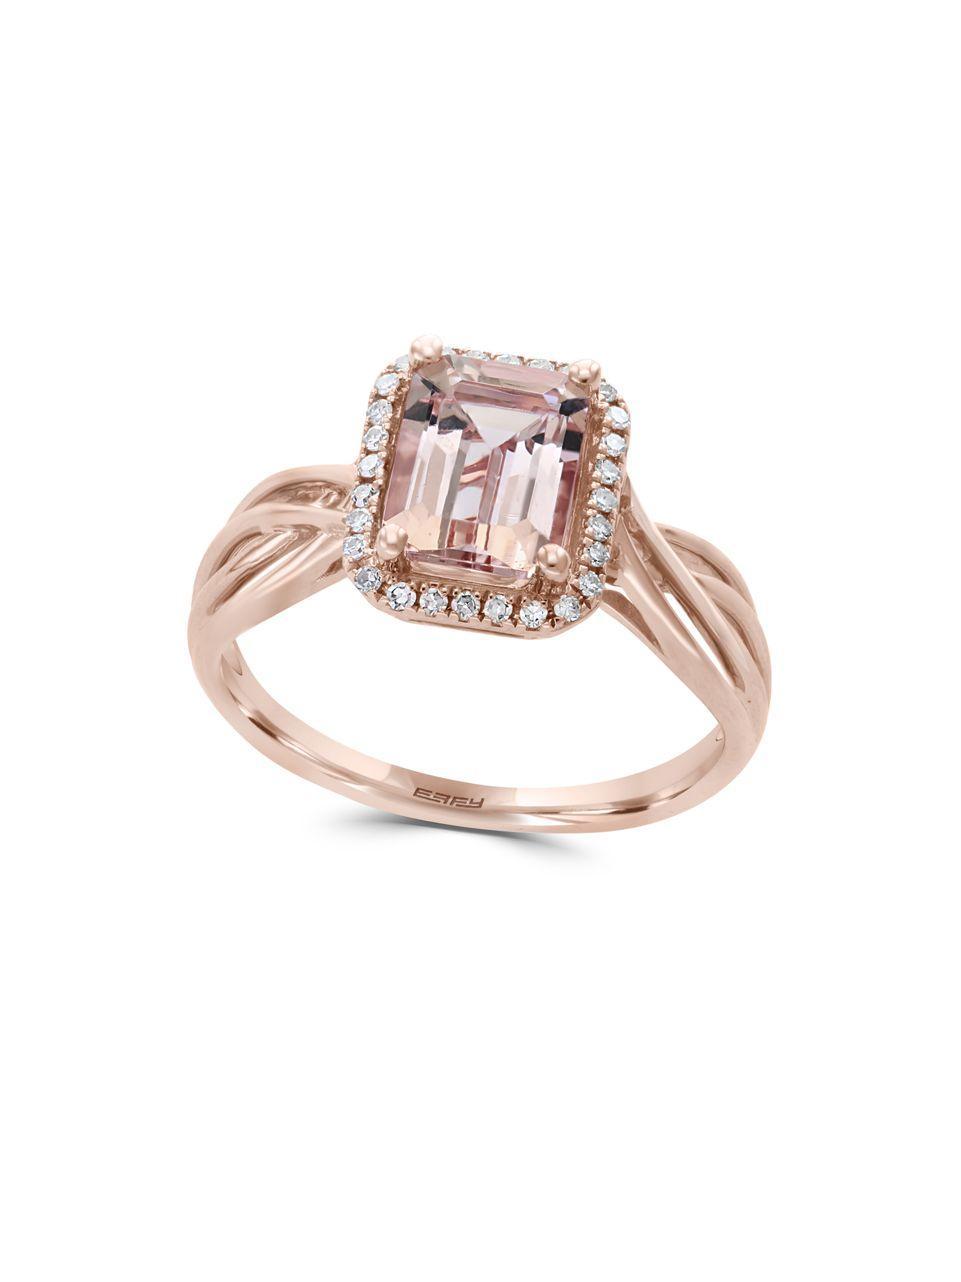 lyst effy morganite diamond and 14k rose gold ring in. Black Bedroom Furniture Sets. Home Design Ideas